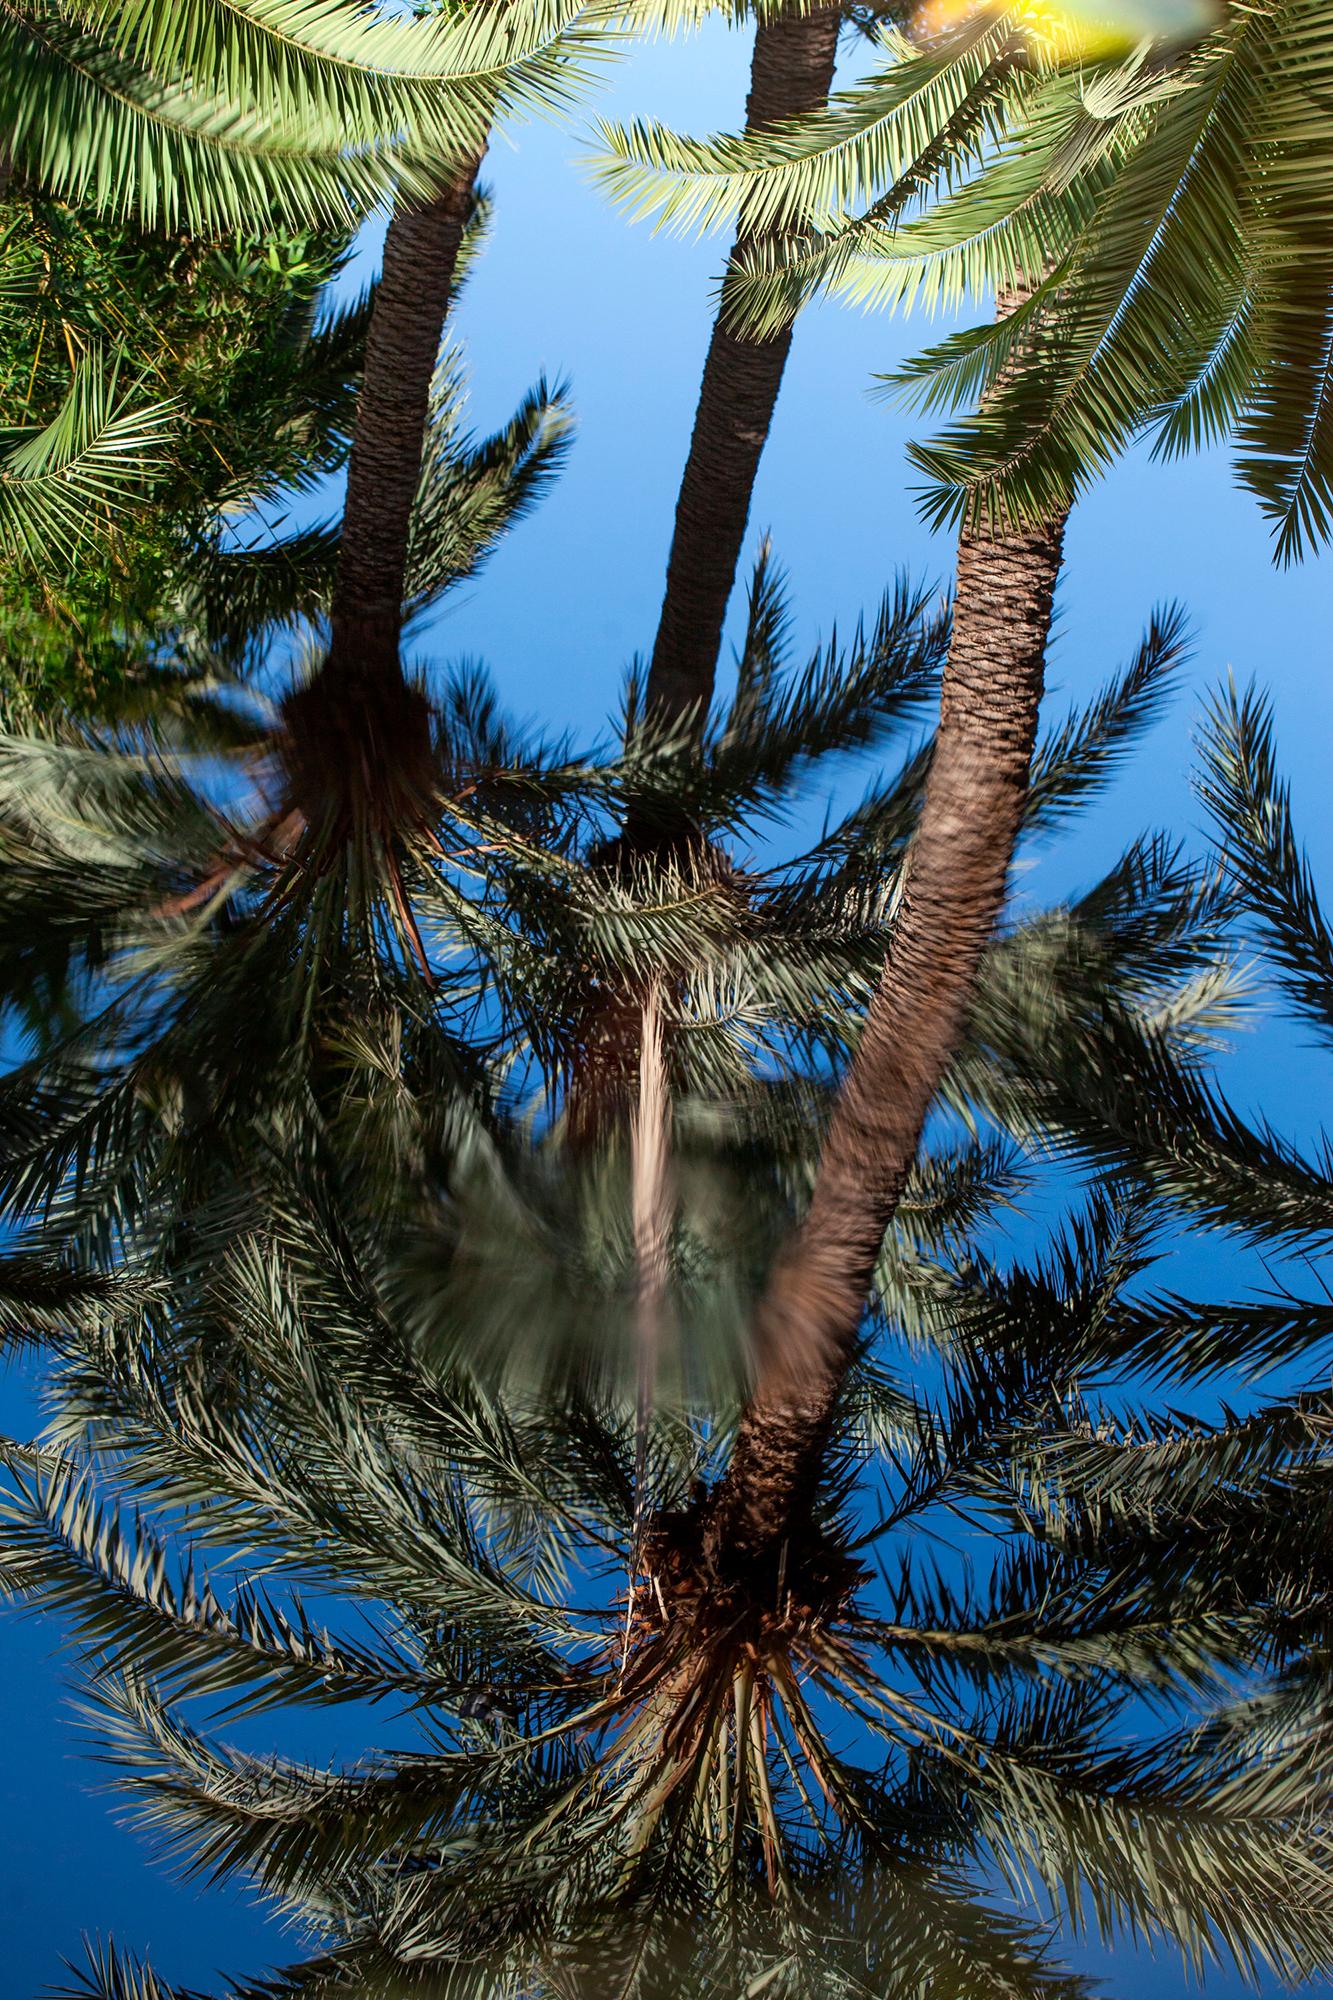 palmier reflet maroc